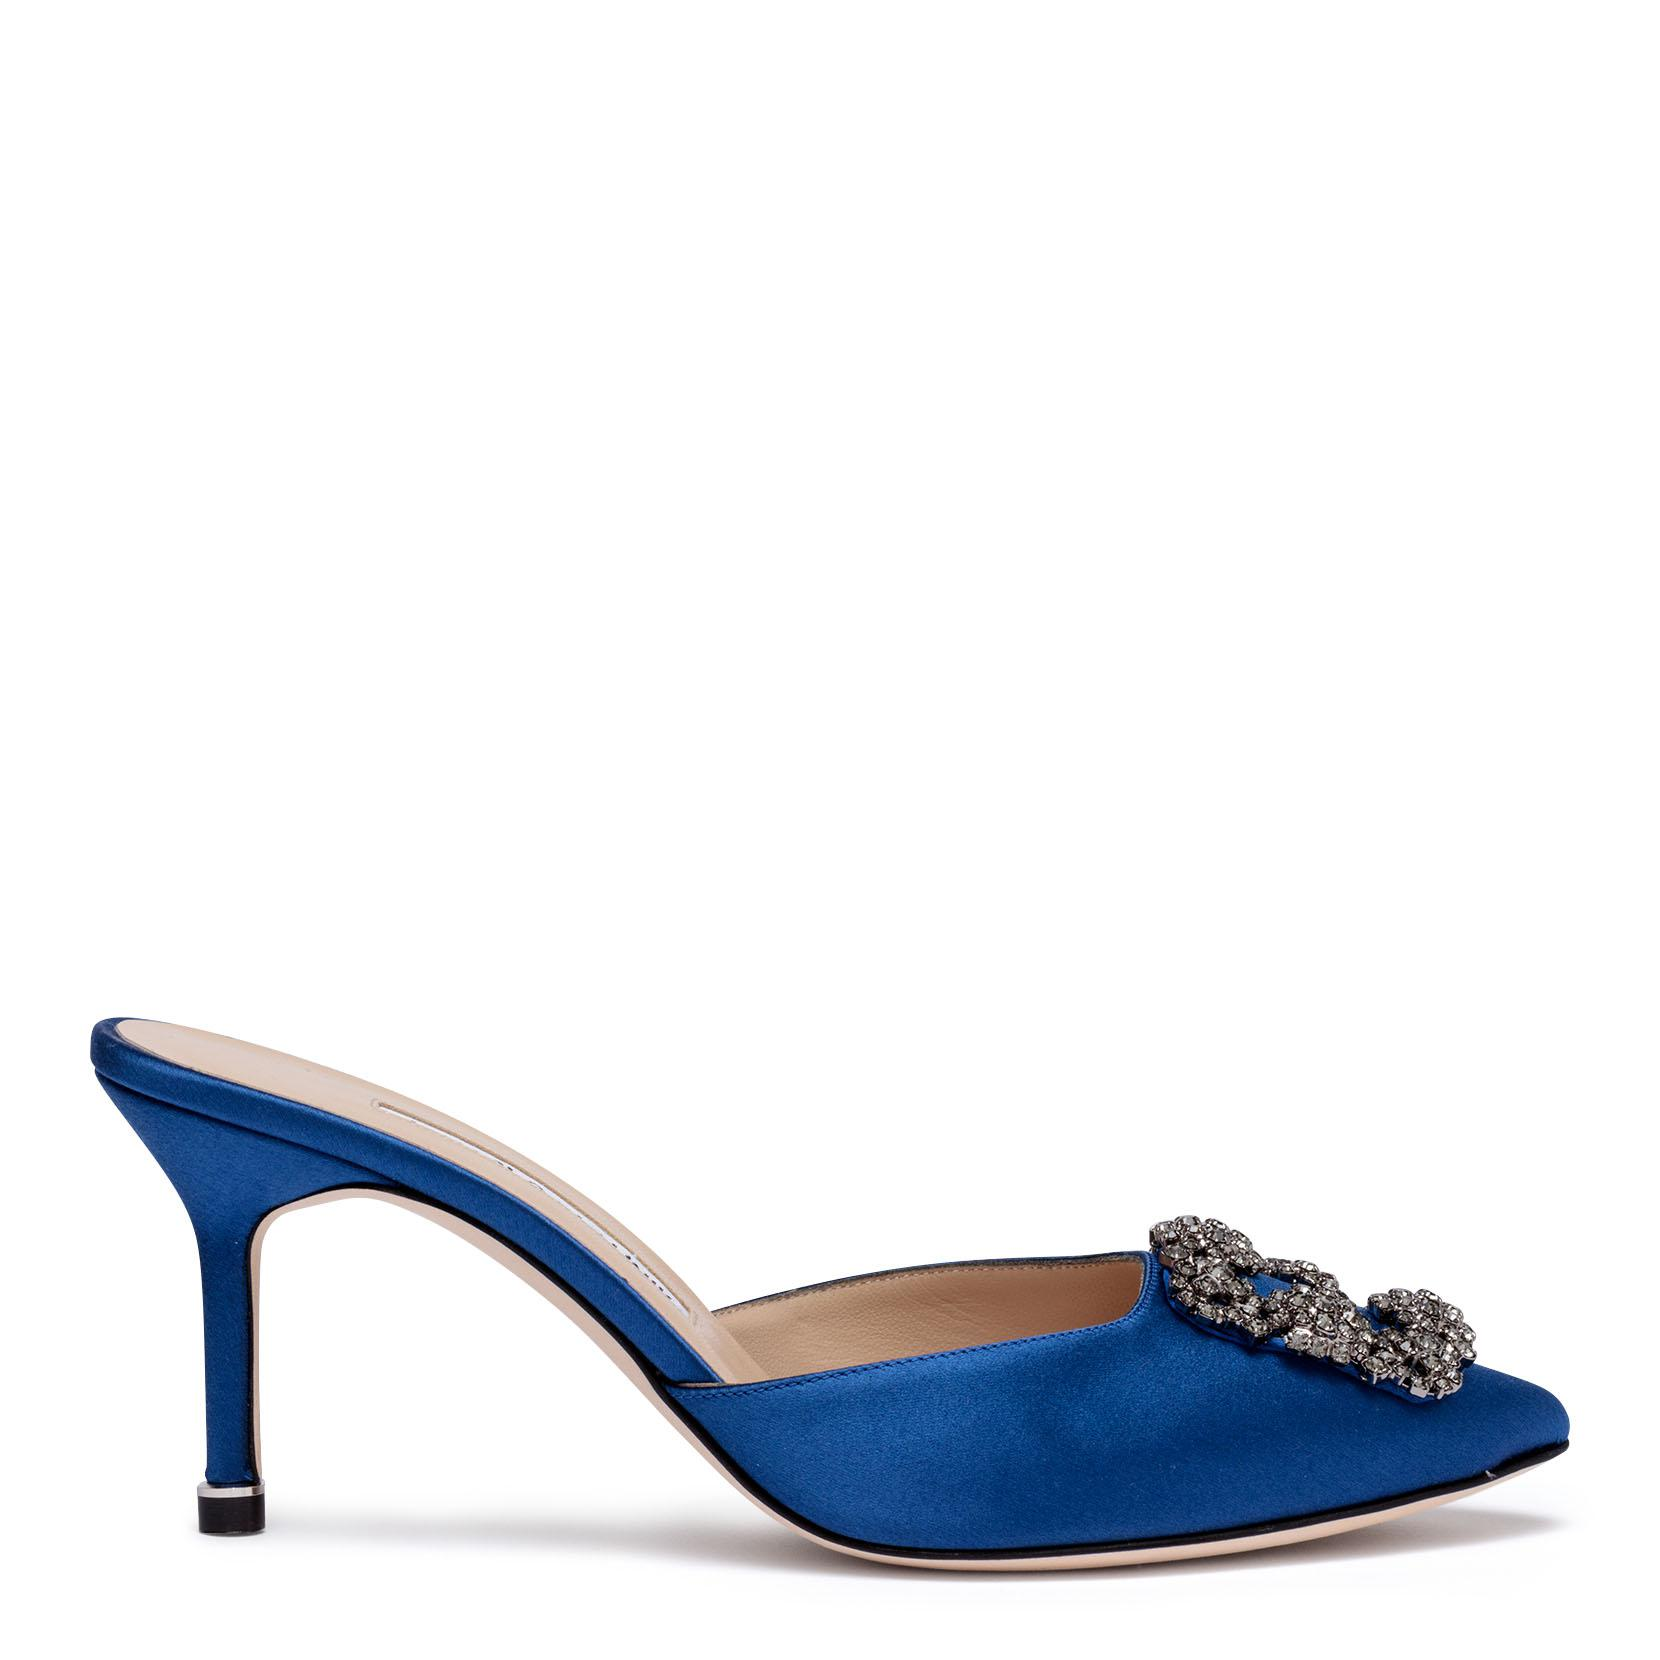 Hangisimu 70 royal blue satin mules Manolo Blahnik 3iXs4AX8